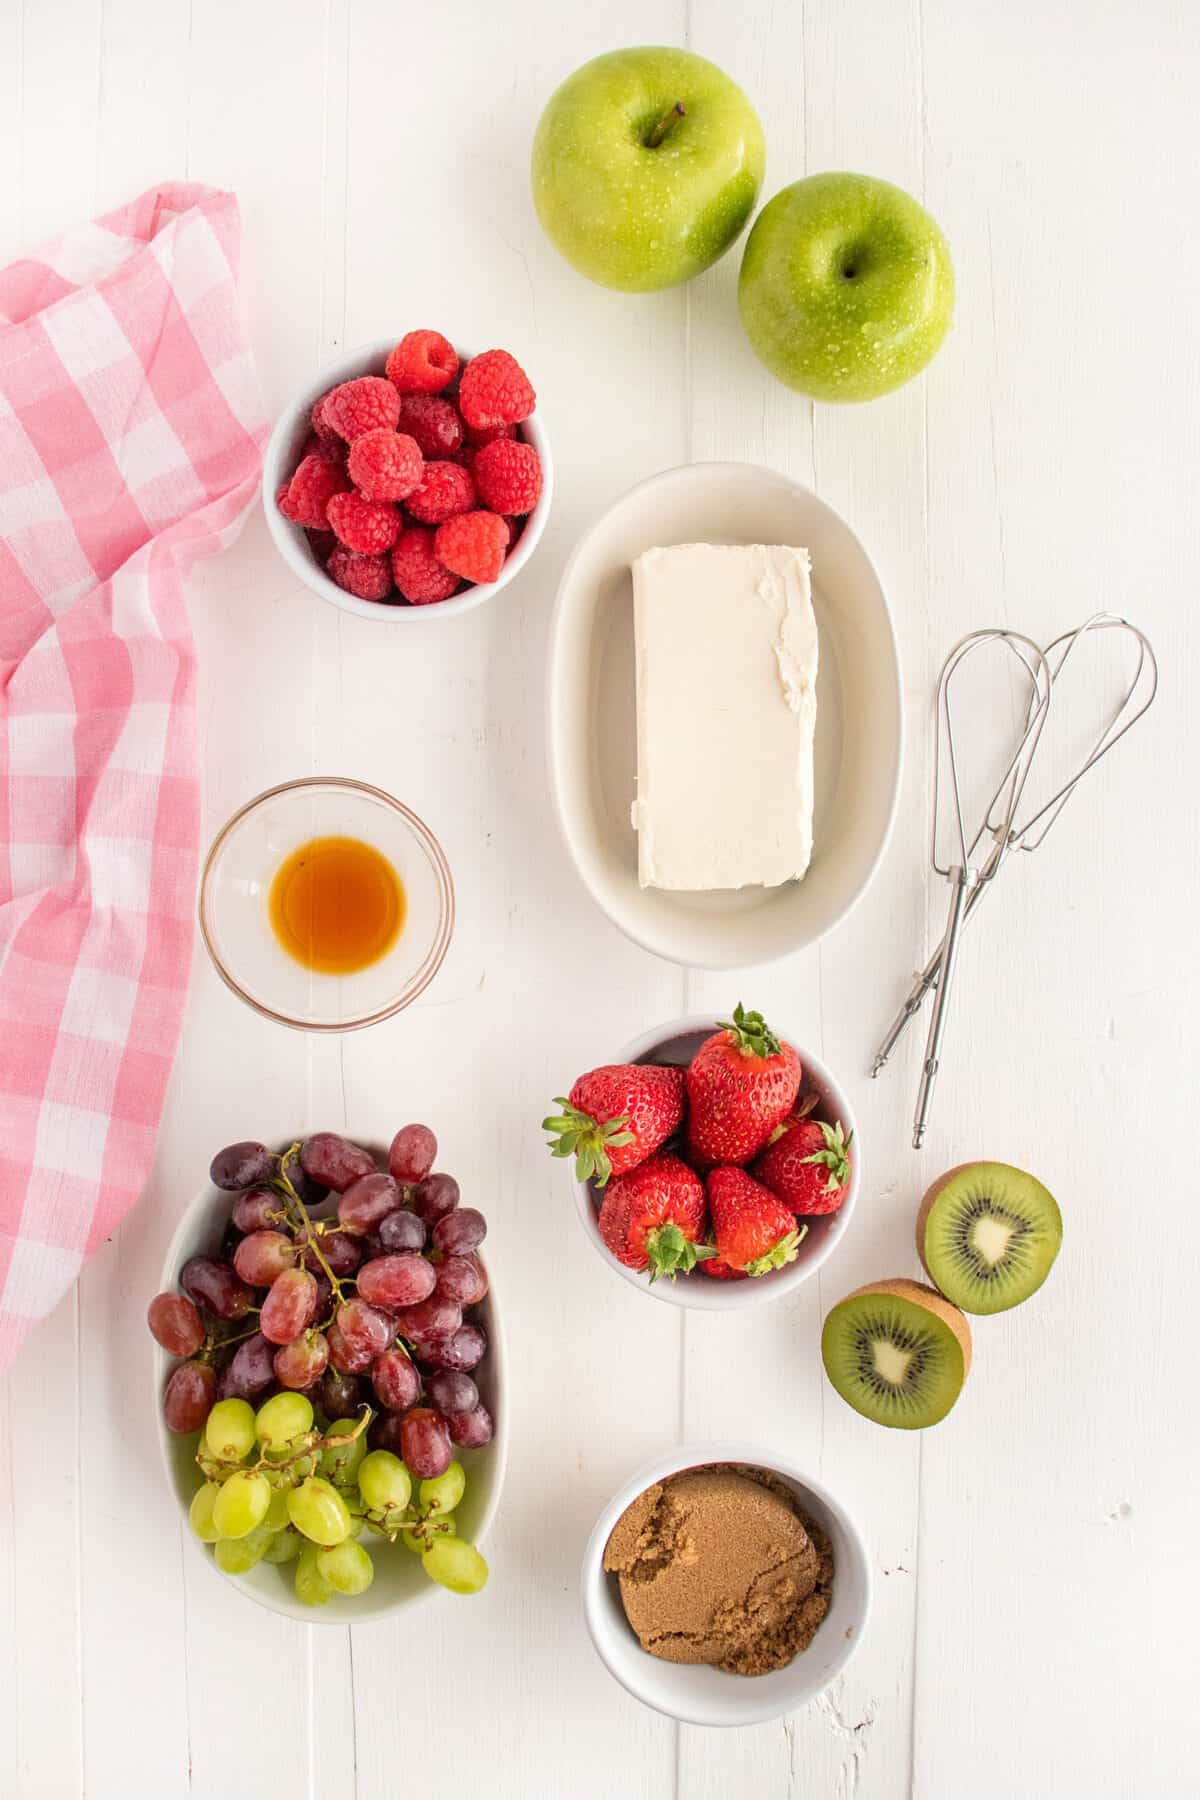 ingredients for fruit dip